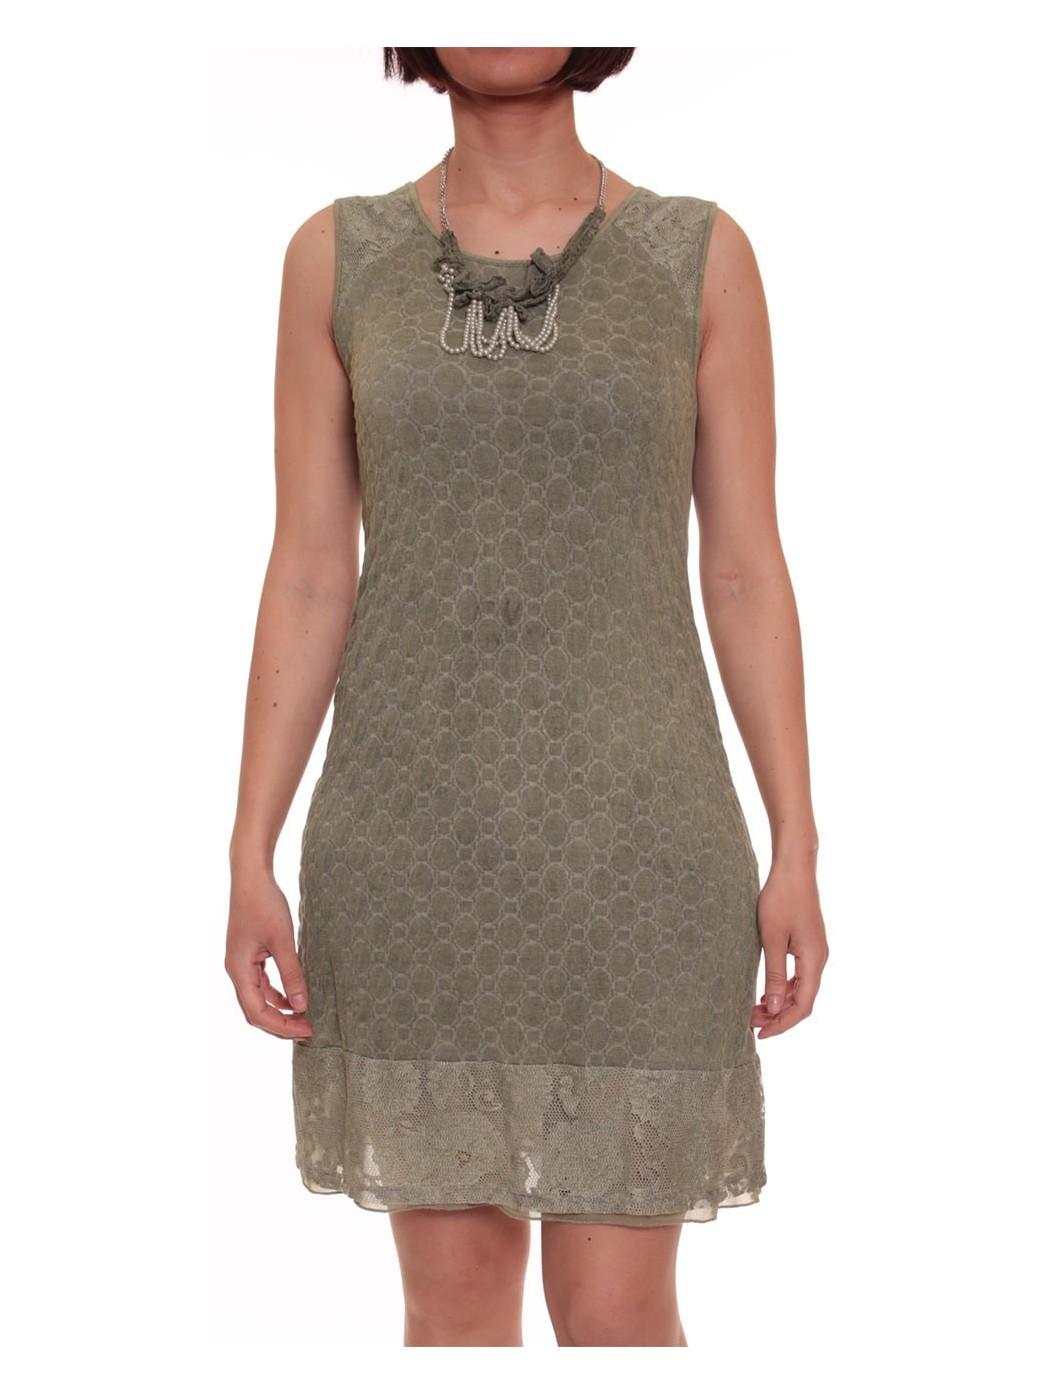 Roberta Picchiante dress